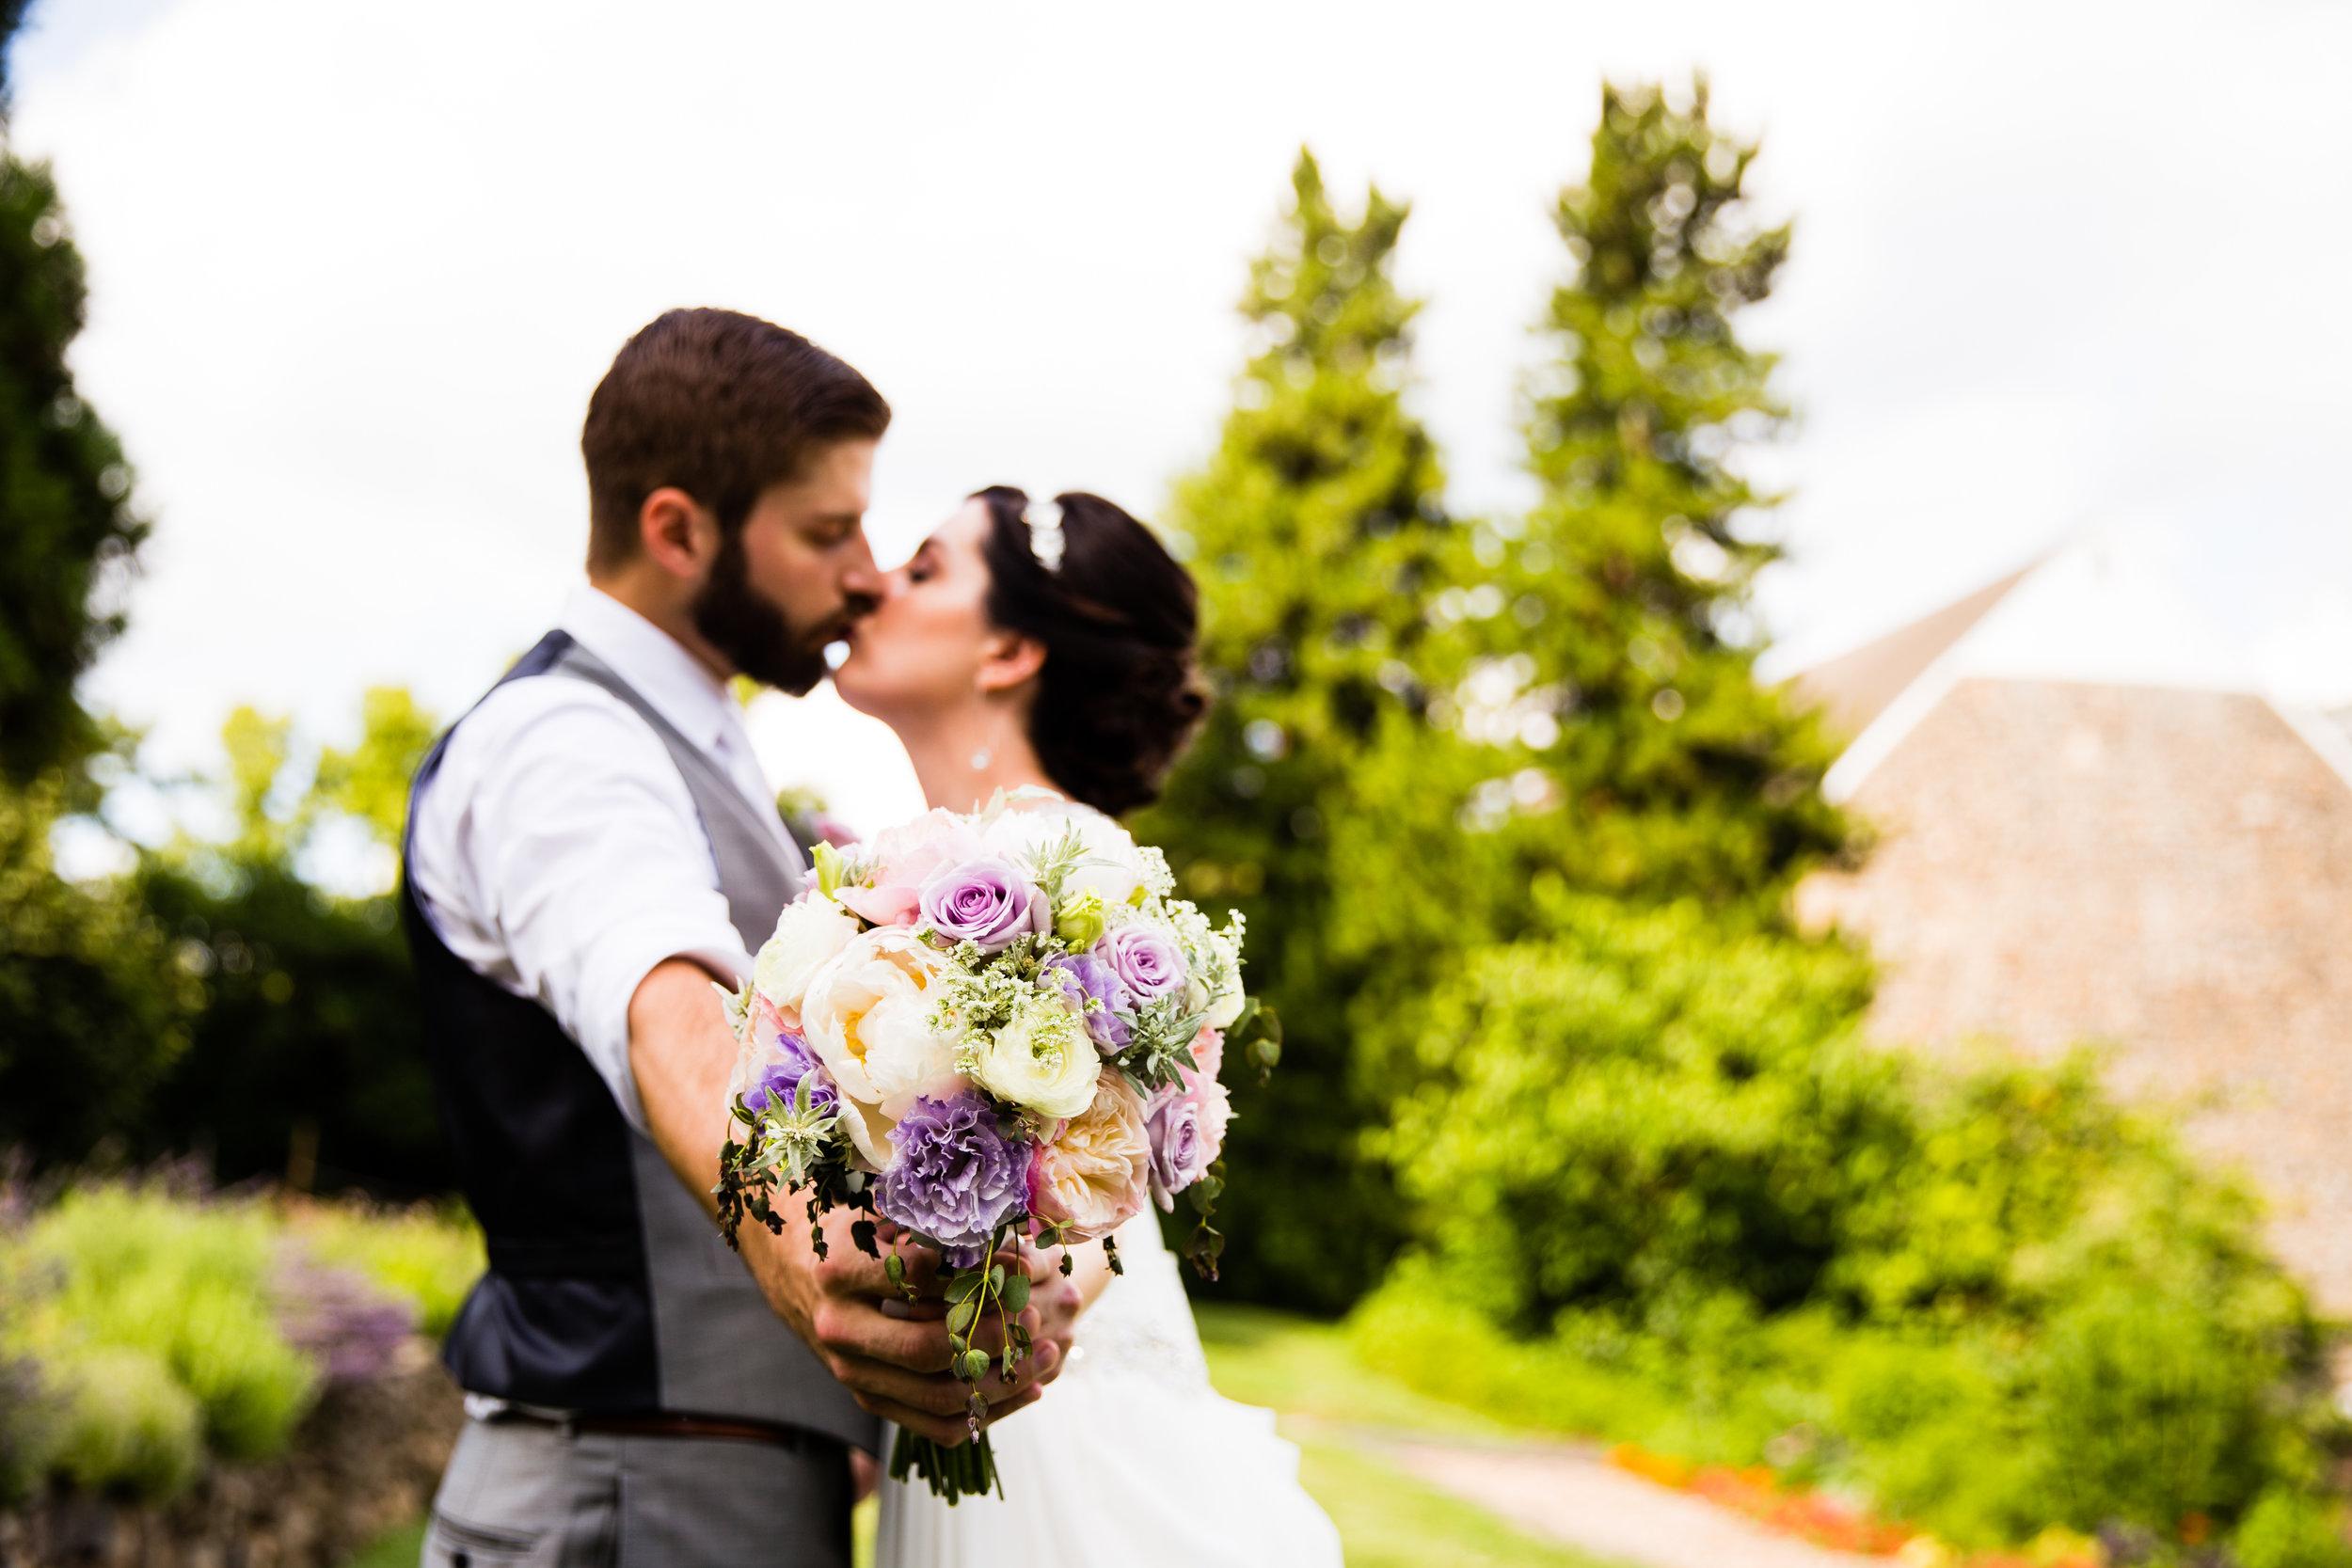 TYLER ARBORETUM WEDDING PHOTOGRAPHY LOVESTRUCK PICTURES-043.jpg